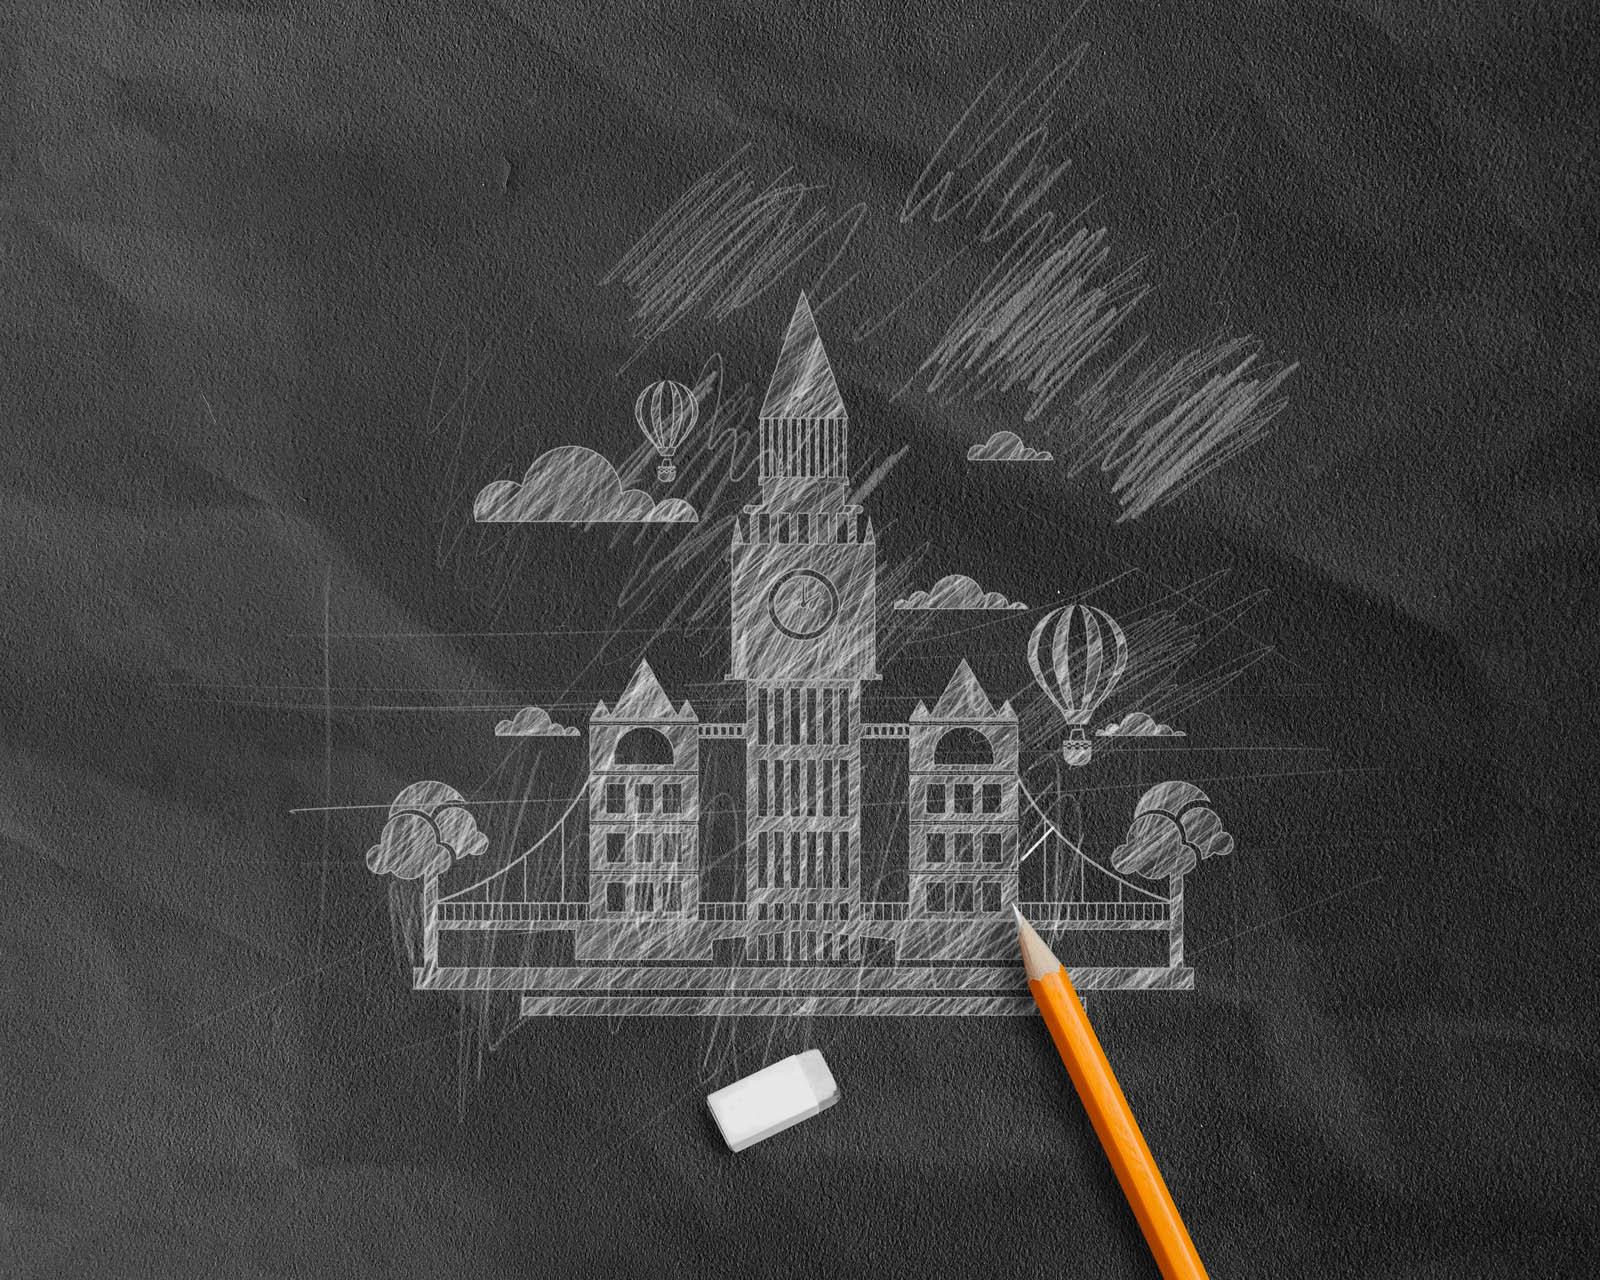 Photoshop Pencil Sketch Effect